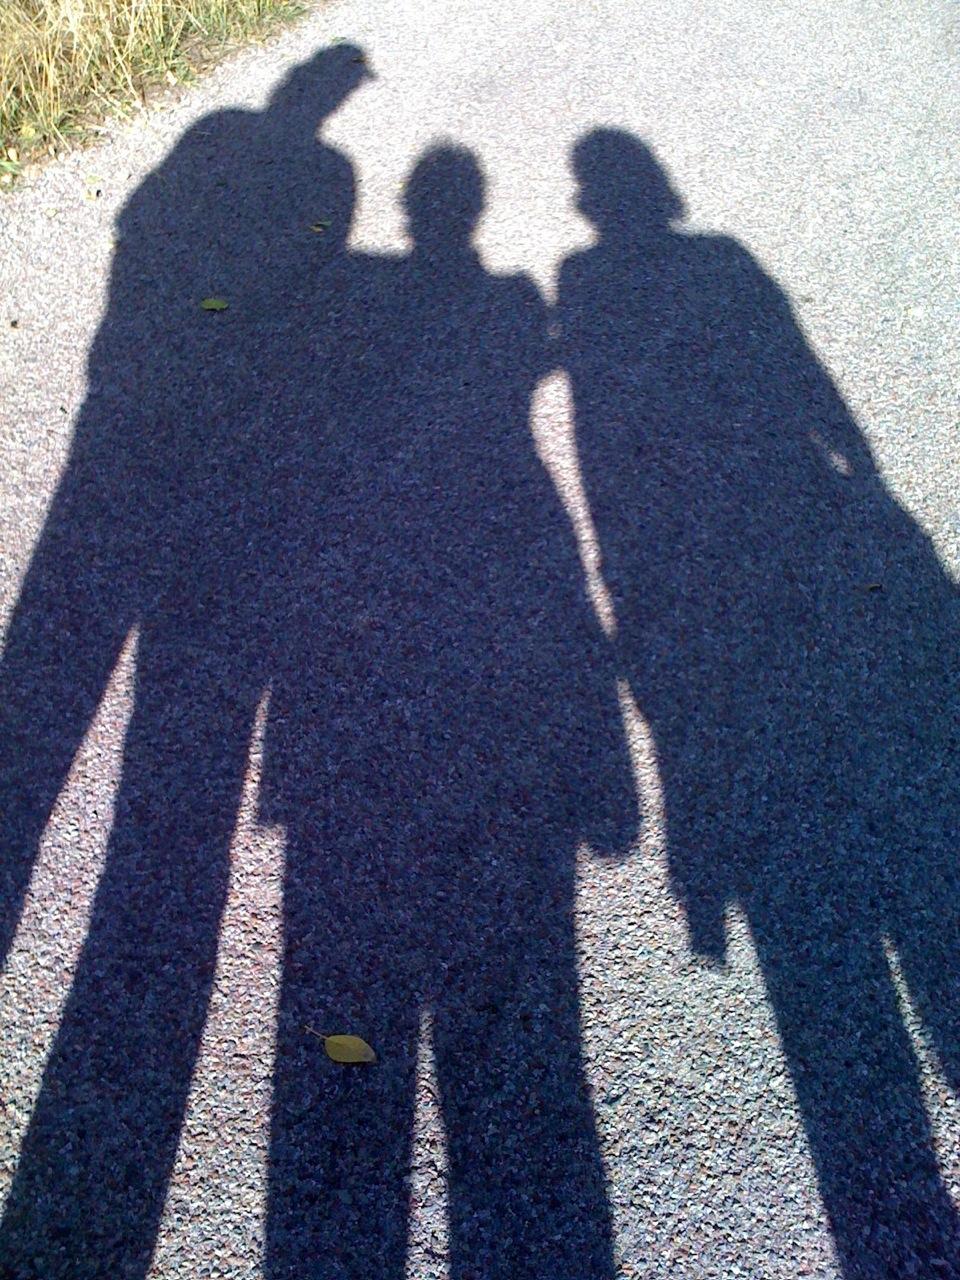 group shadow